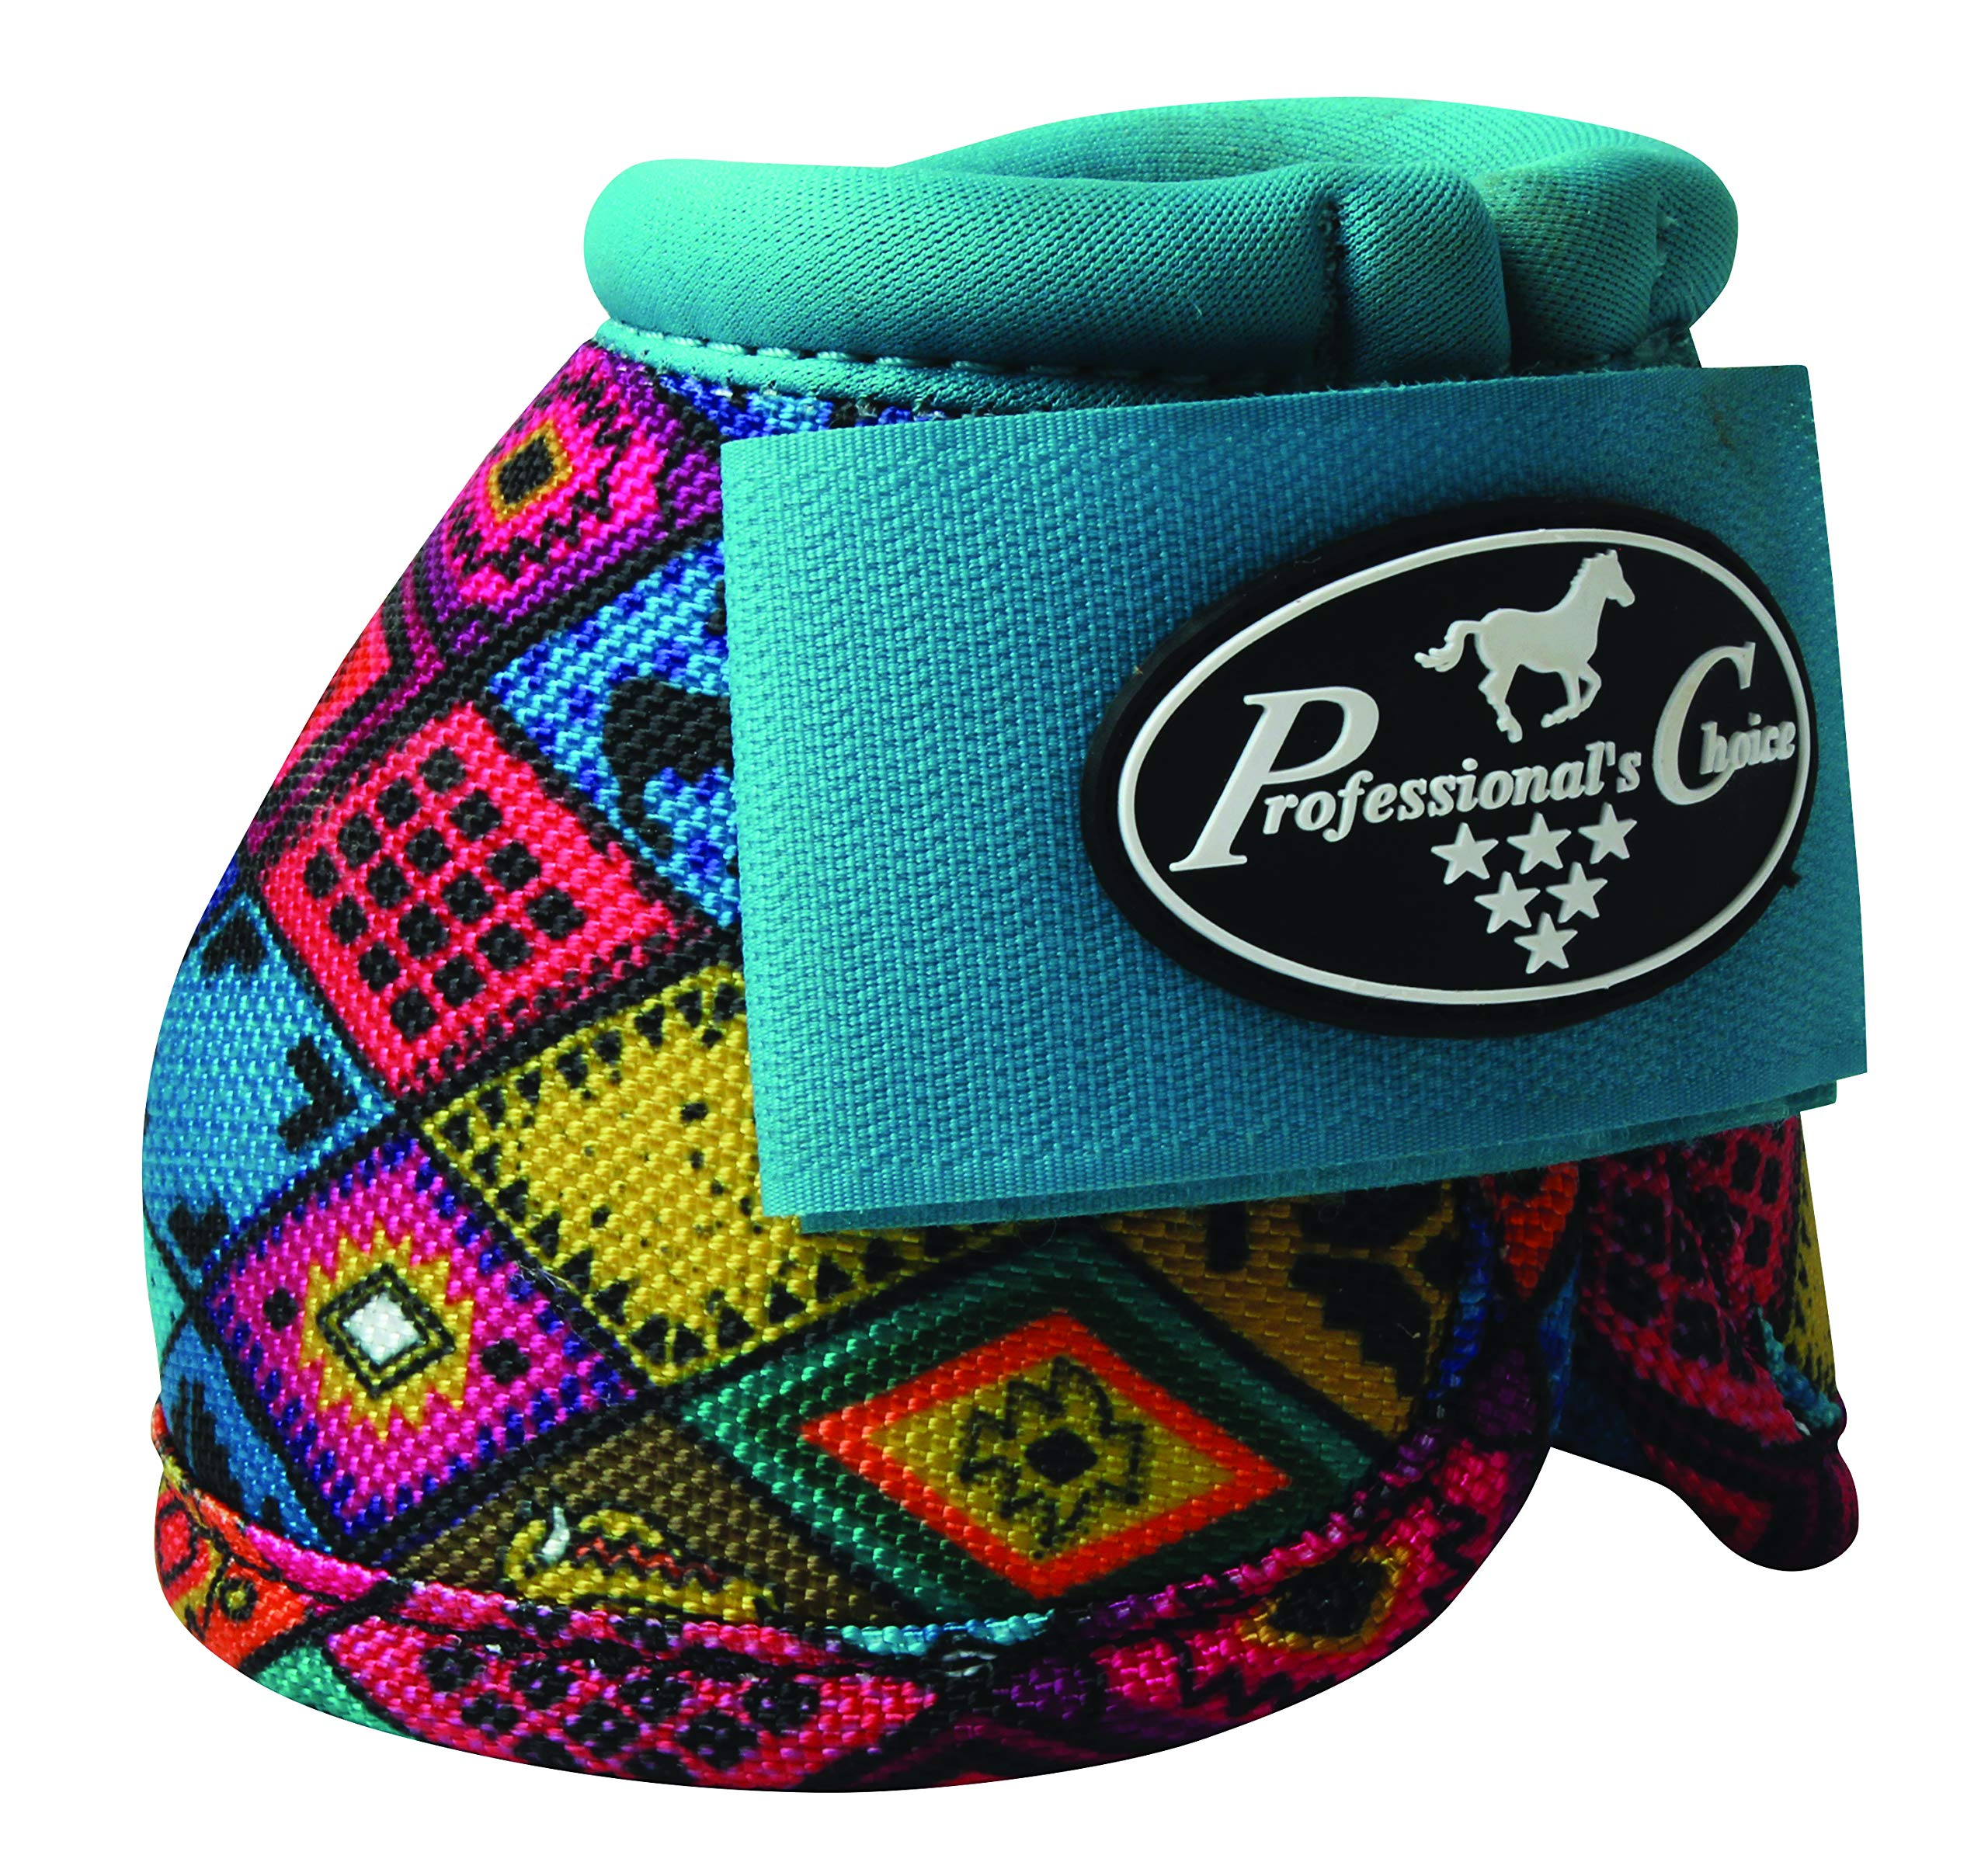 Professional's Choice Horse Equine Overreach Ballistic Bell Boots Ranchero (Medium)